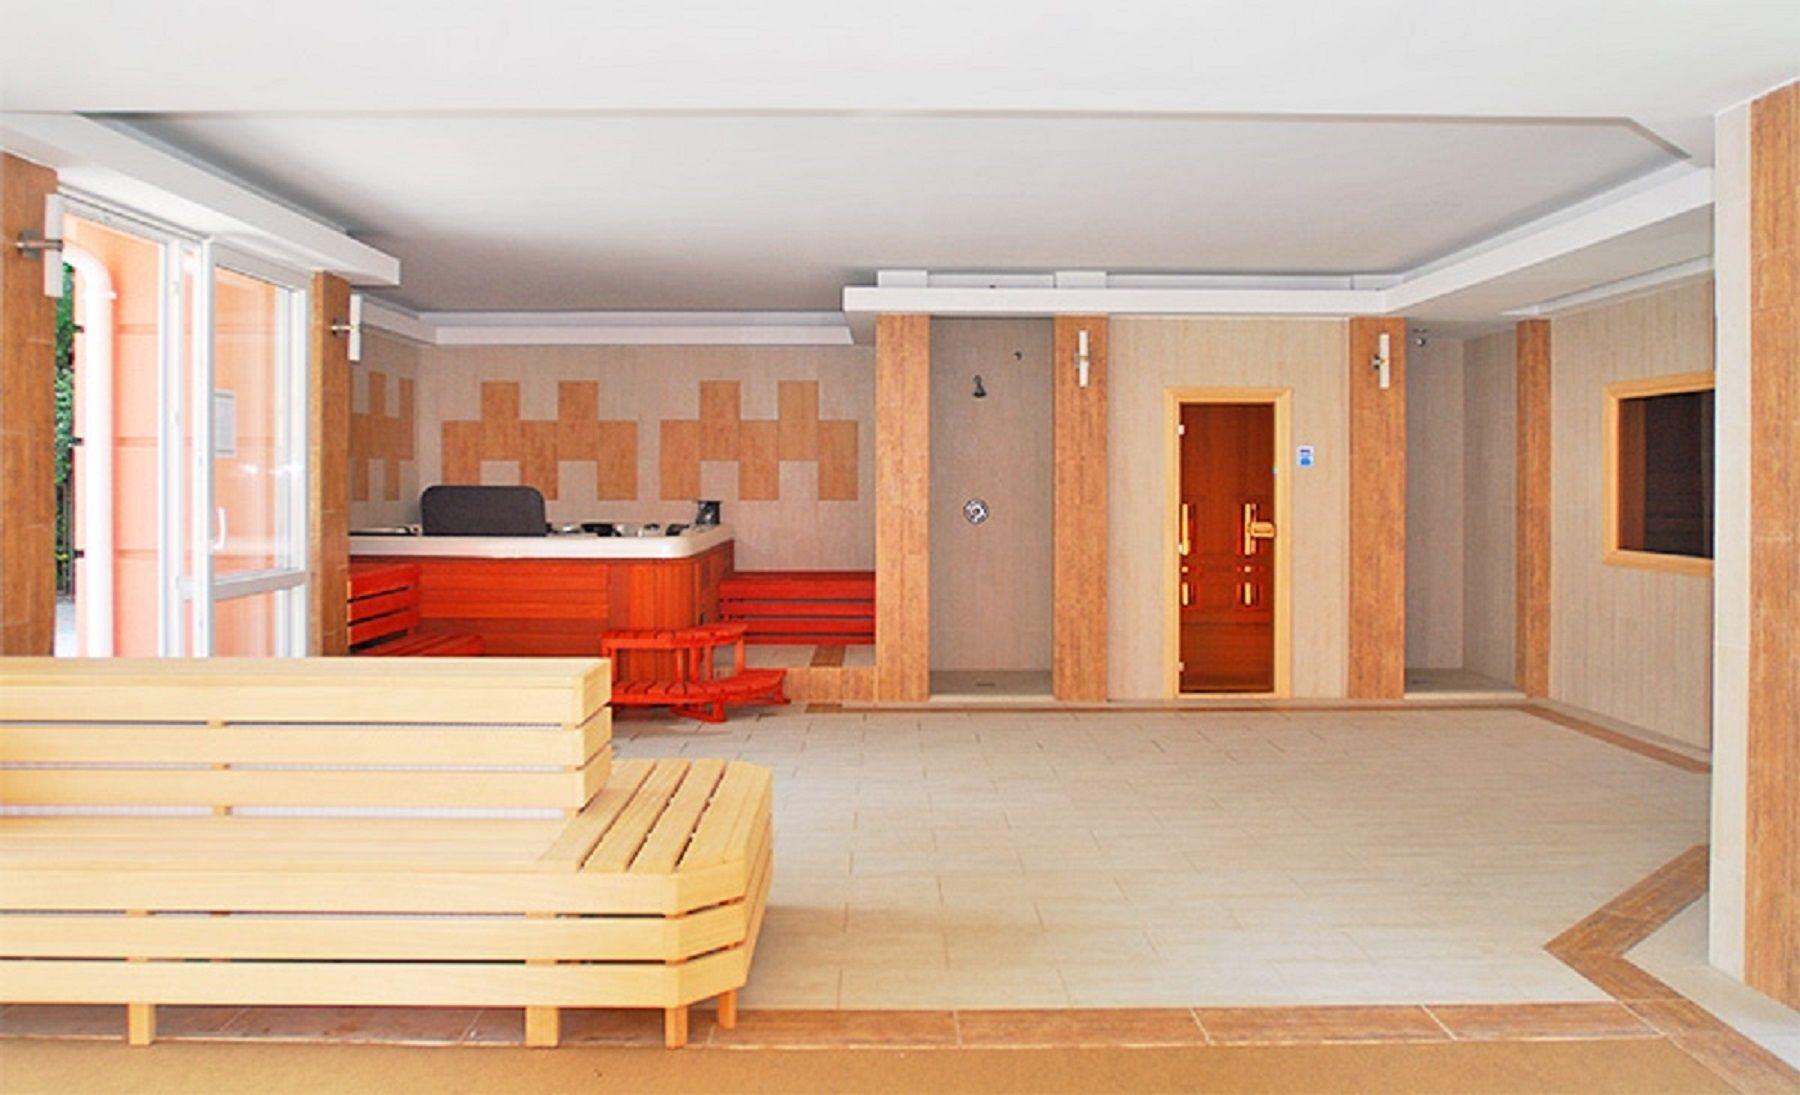 Kitti Sunny Apartmanok Hajdúszoboszló  Hotelguru ro